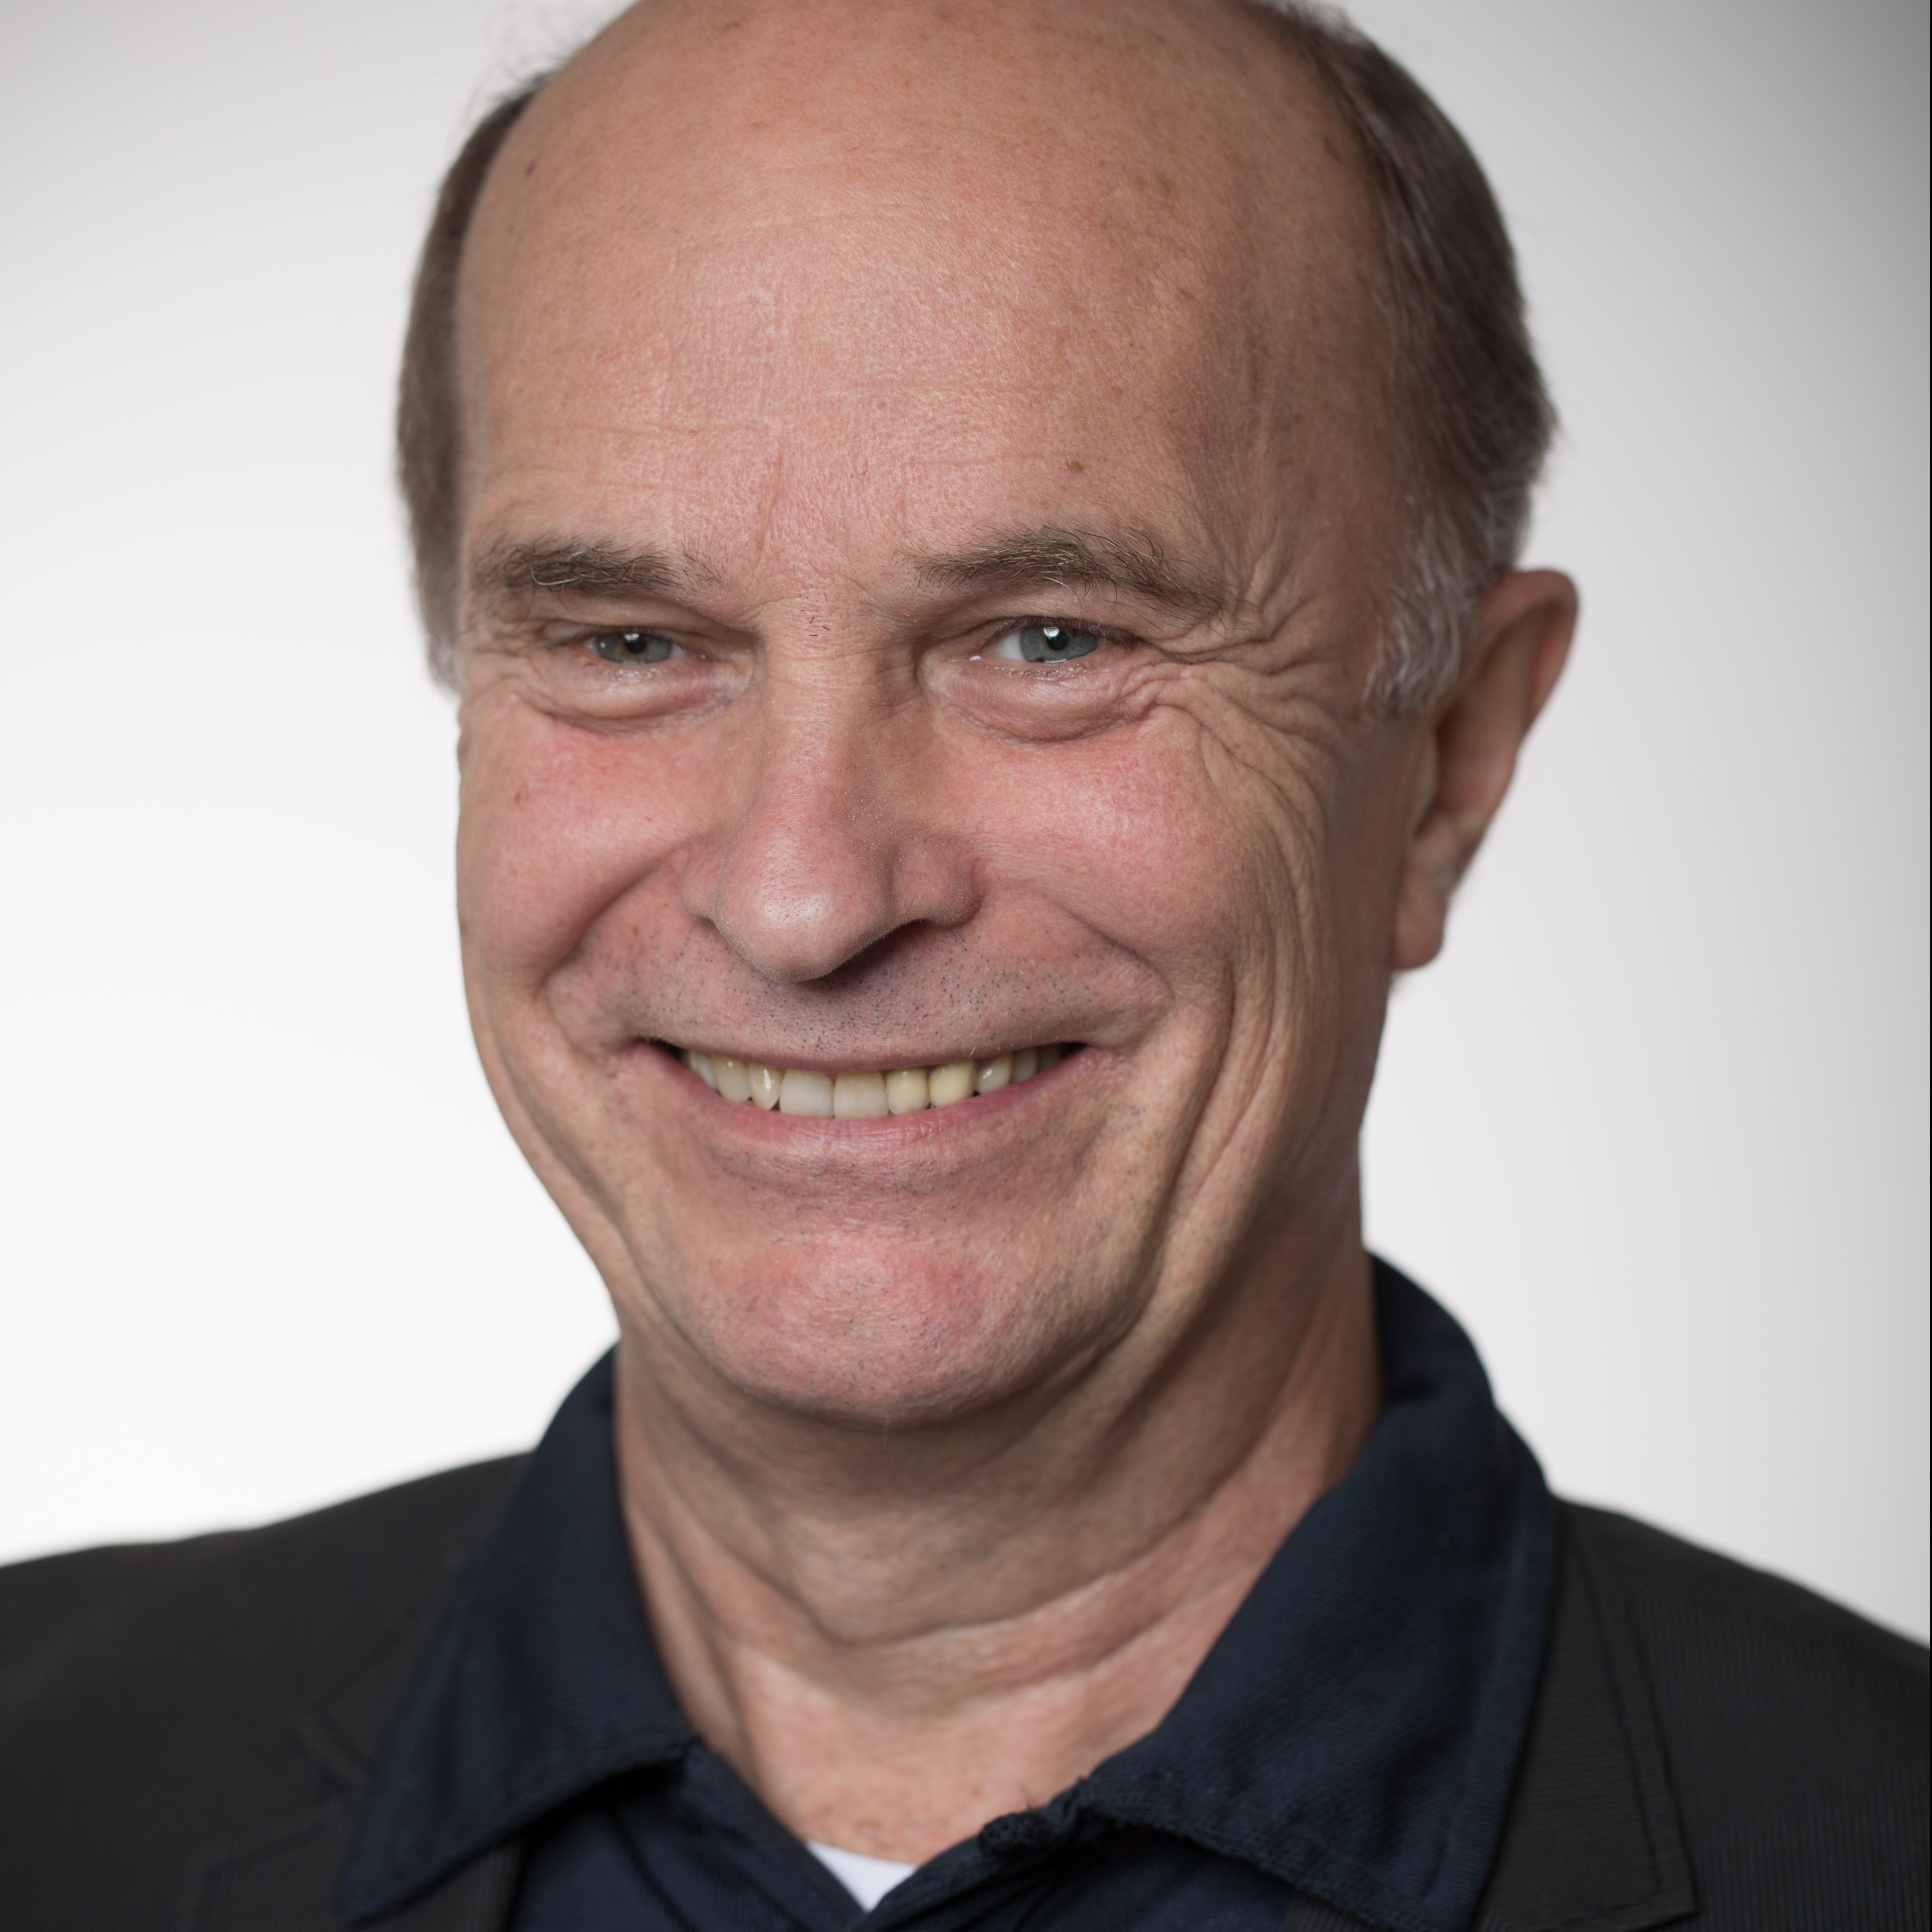 Dr. Anders J. B. Seim